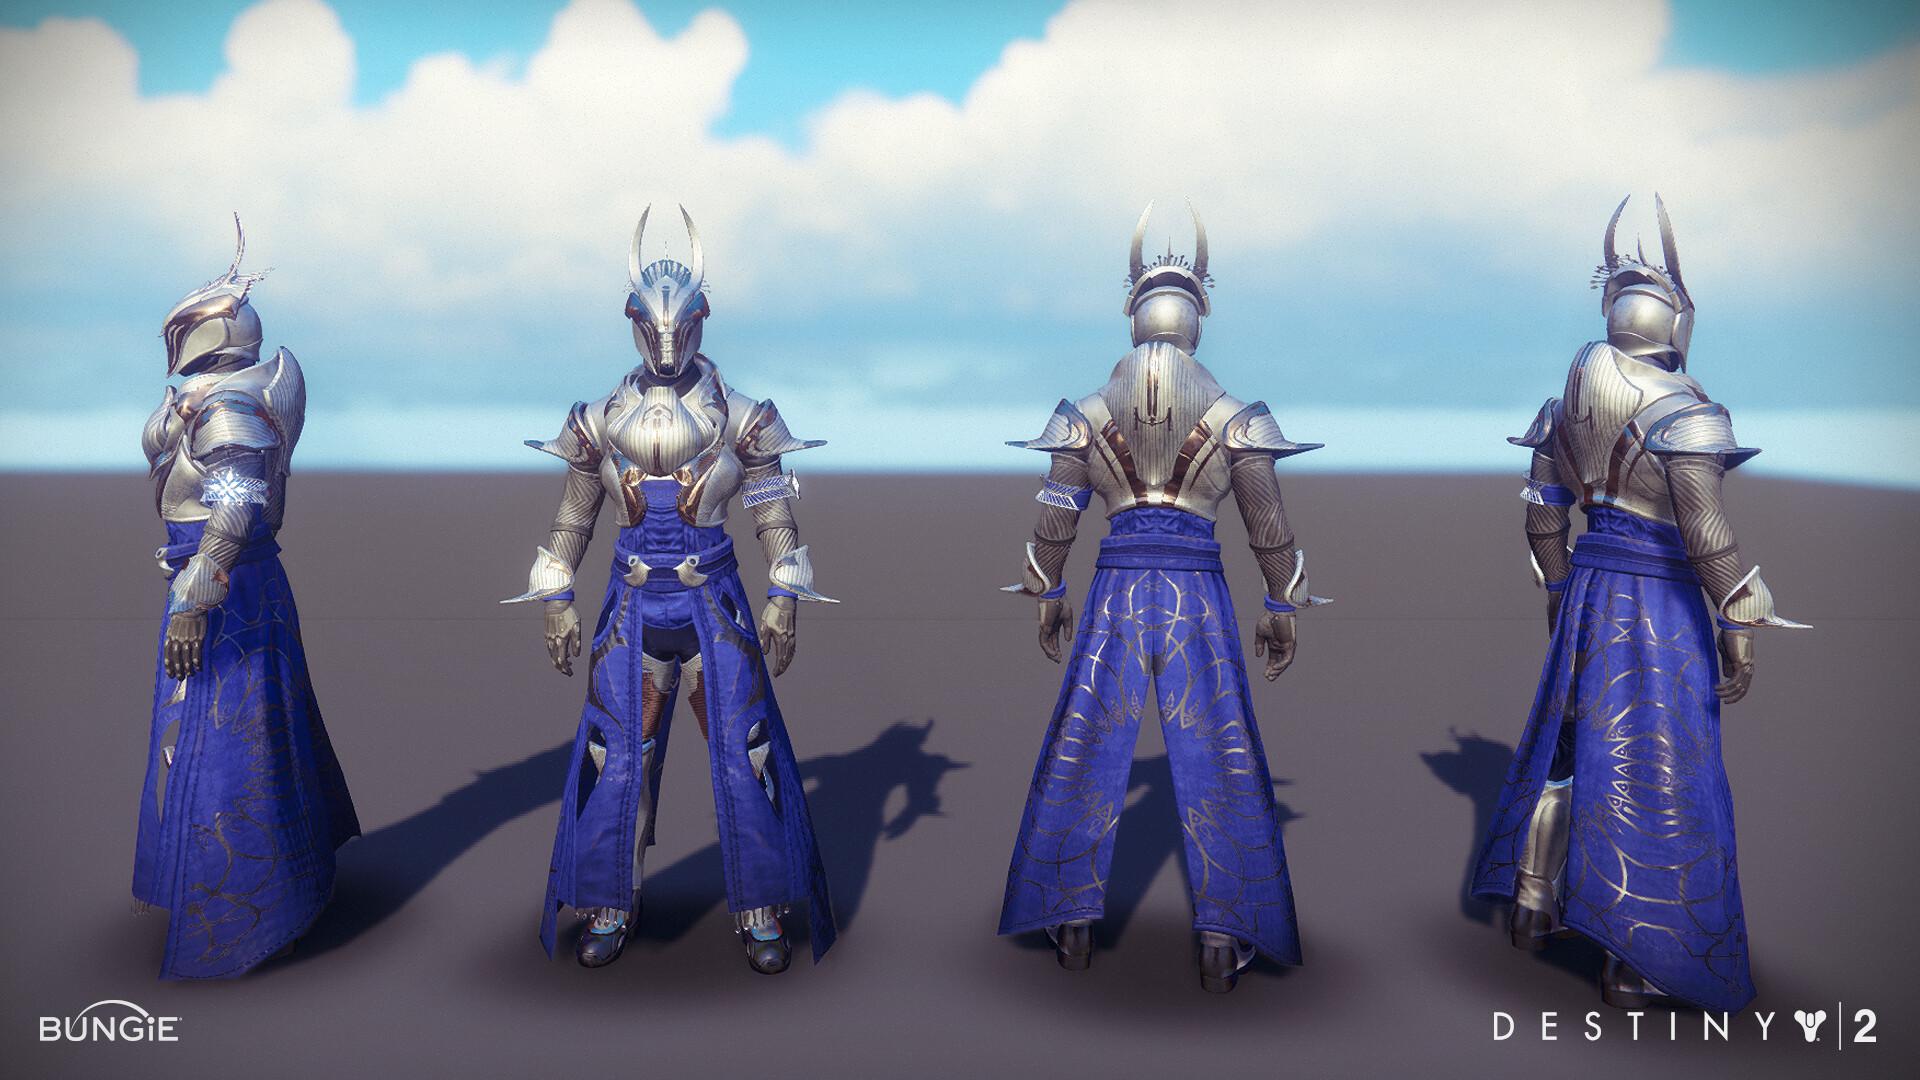 siyu ding - Destiny 2 Dawning Warlock Armor